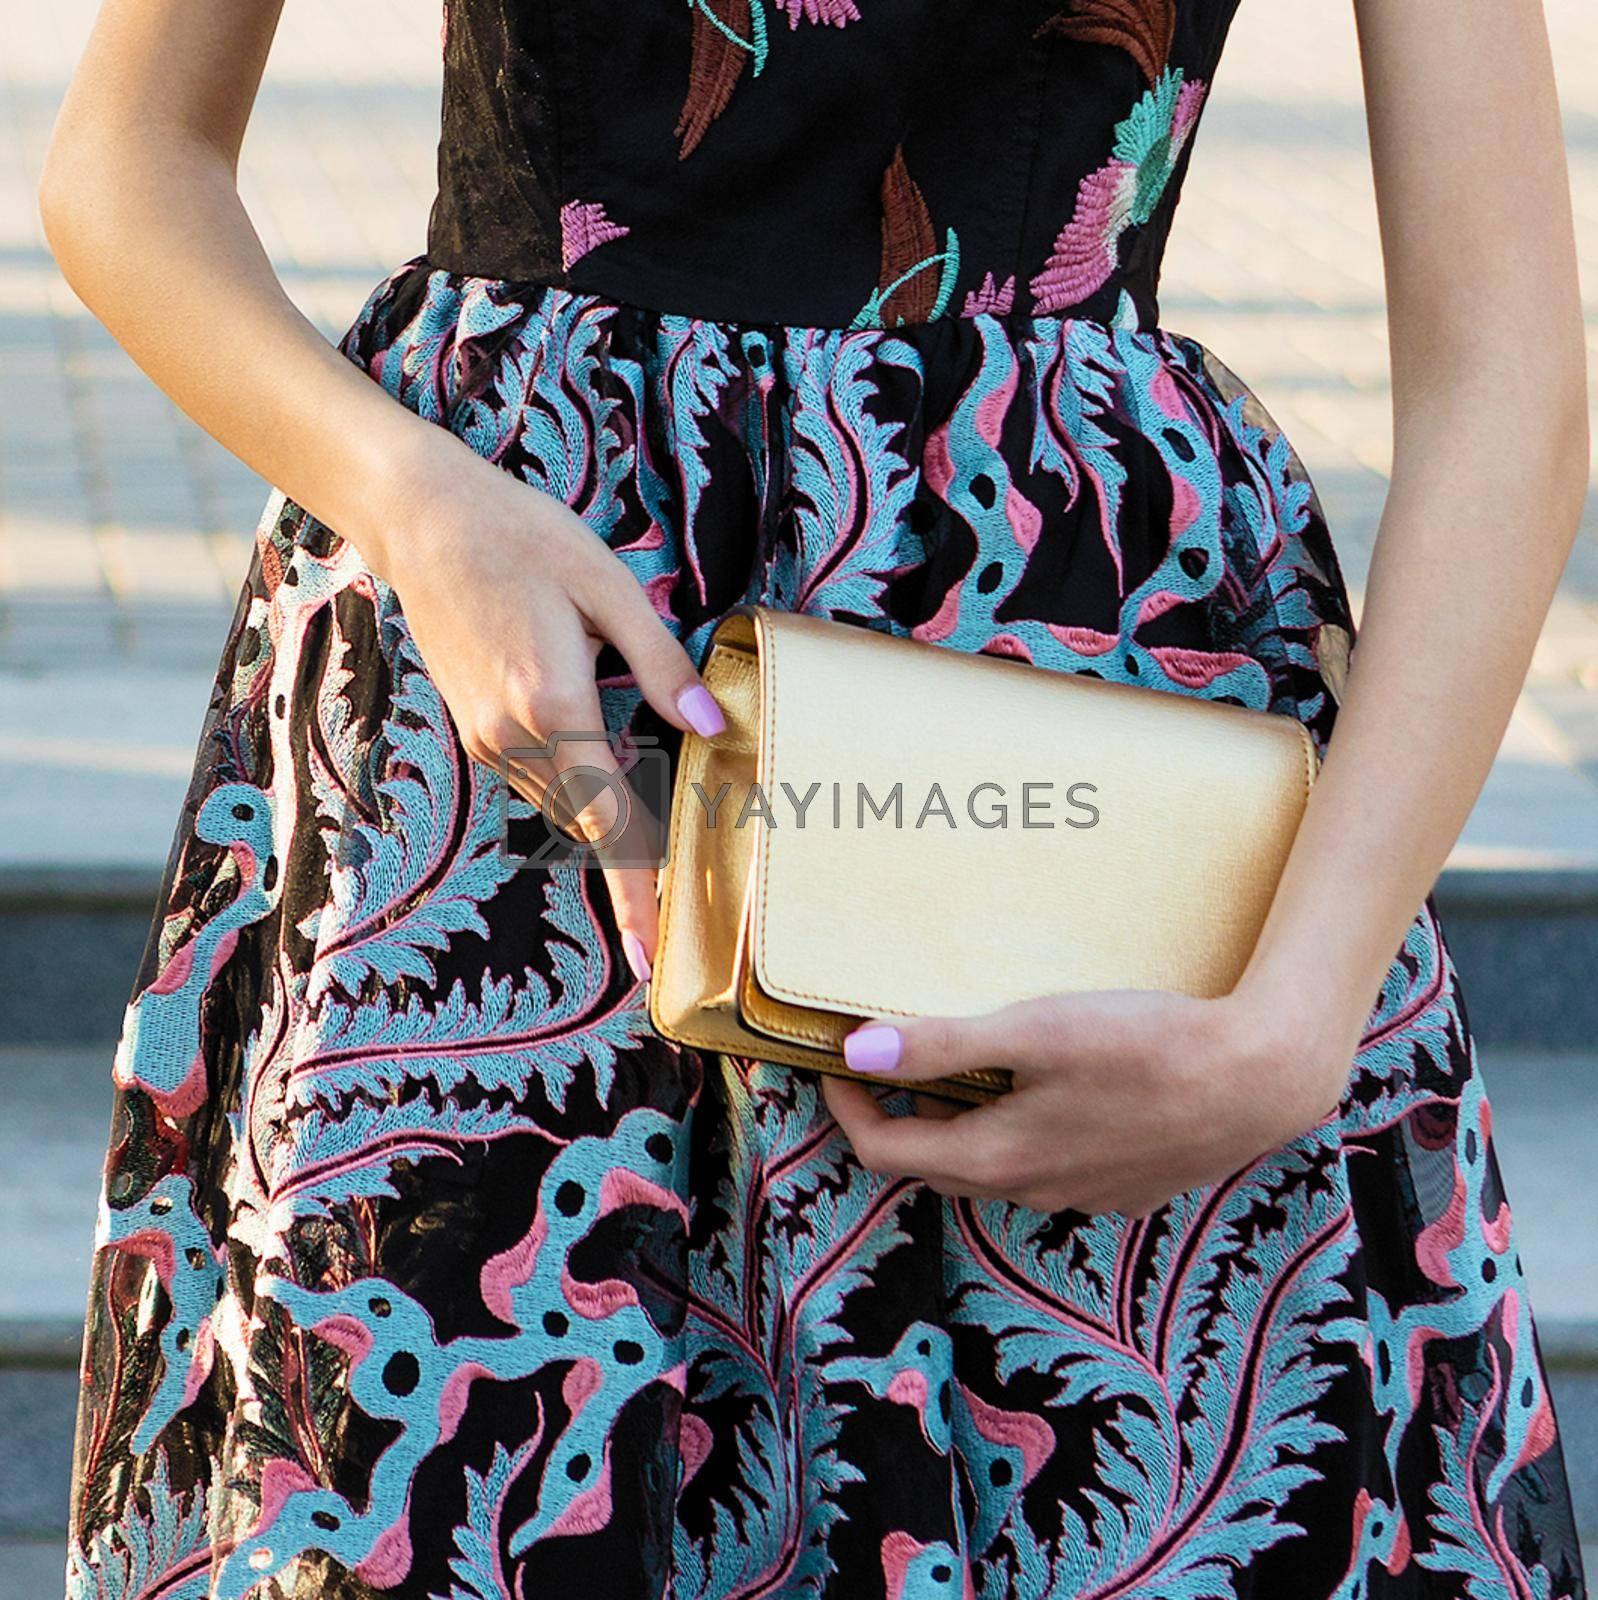 Woman holding a golden handbag close up